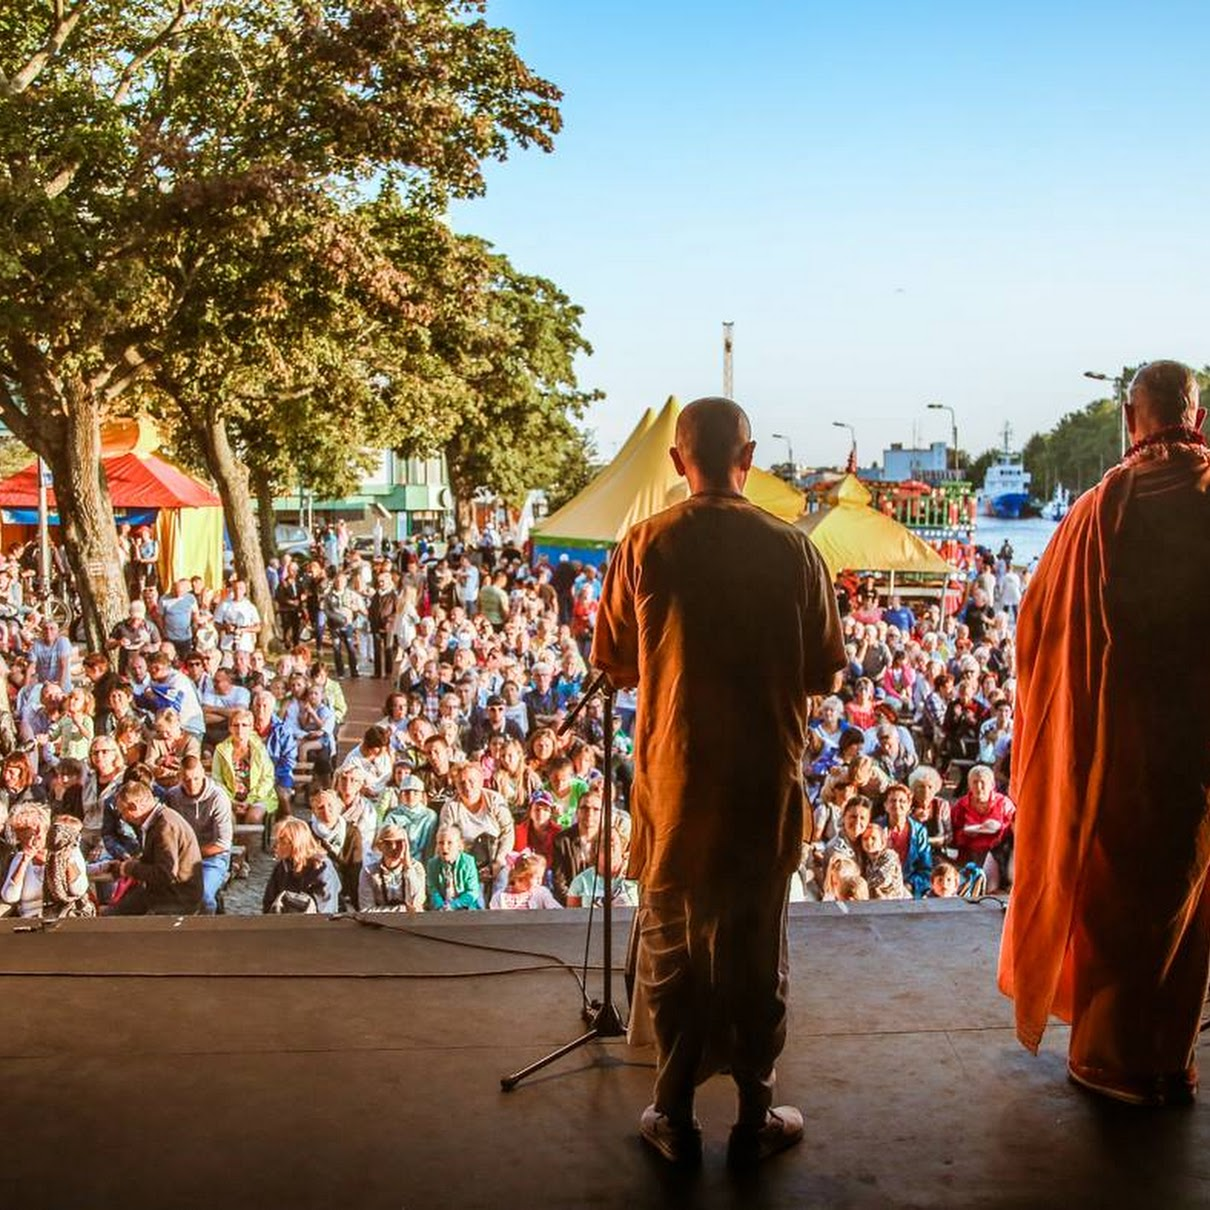 Last Festival